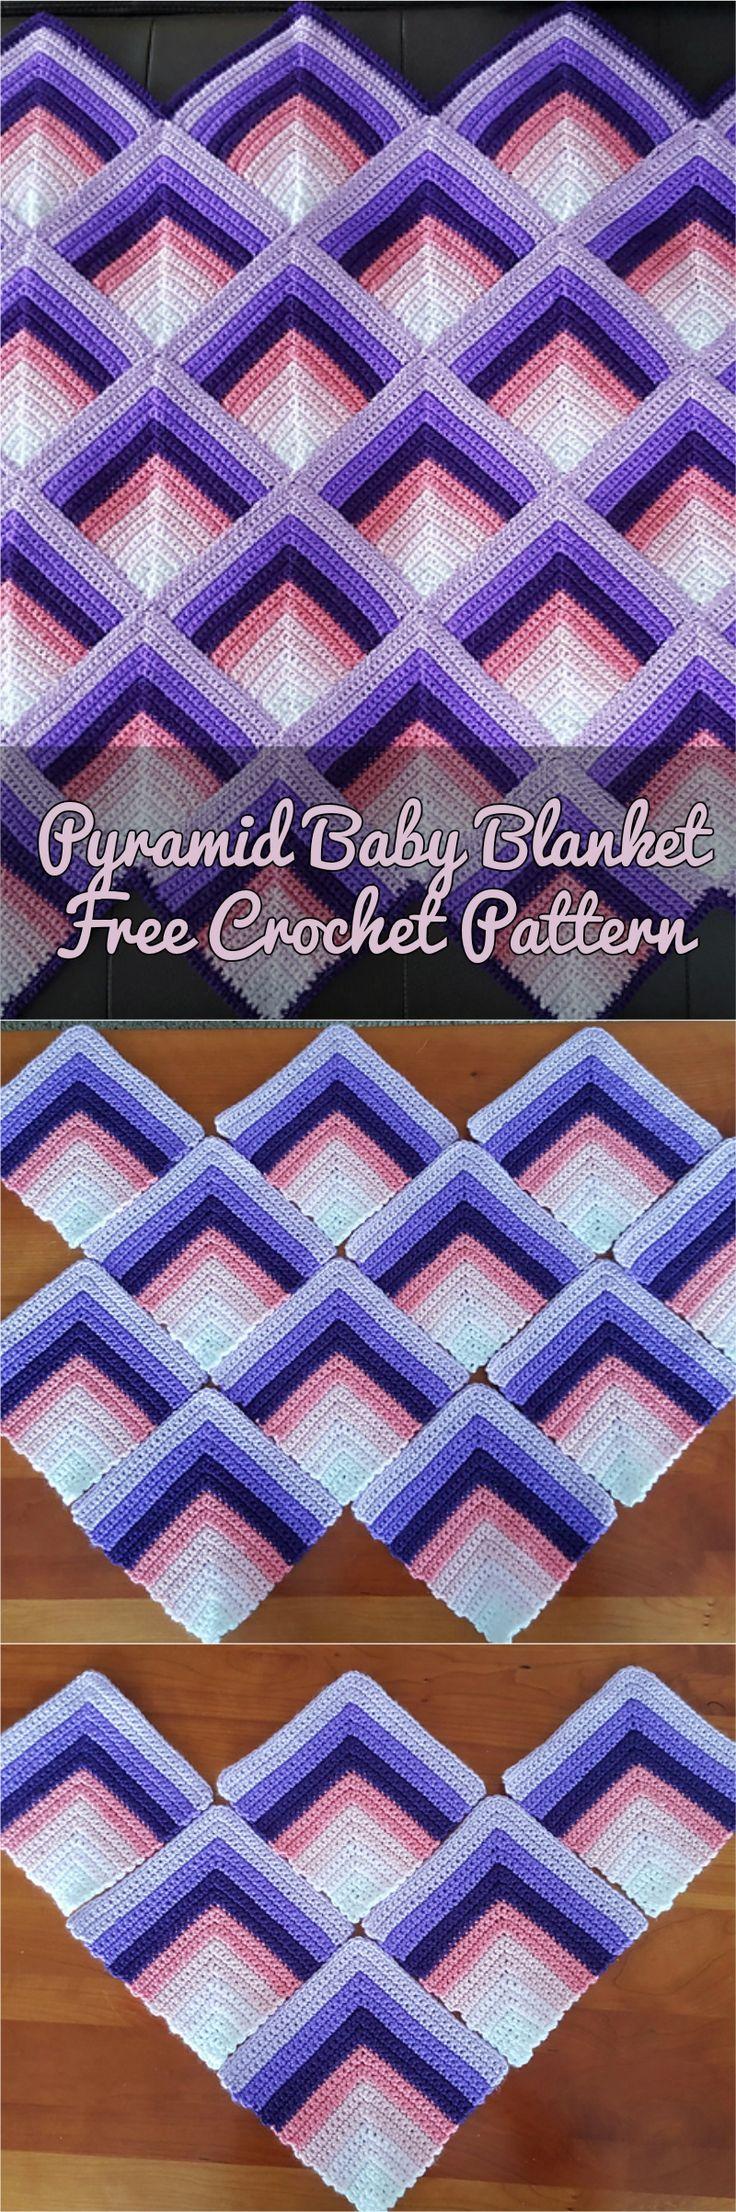 Pyramid Baby Blanket [Free Crochet Pattern]